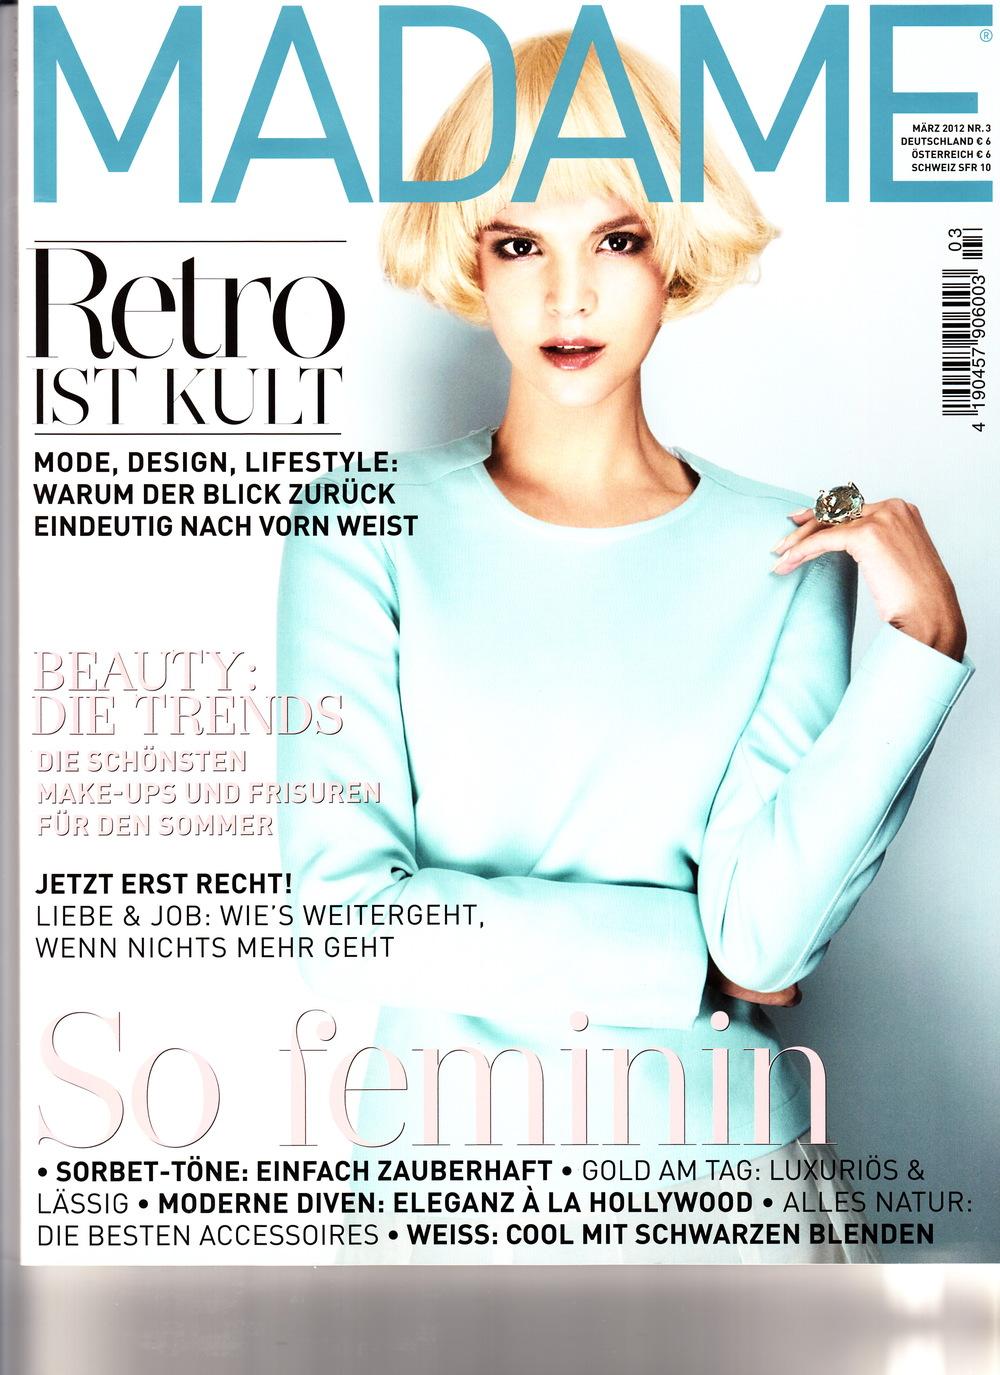 MADAME März 2012 Cover.jpg